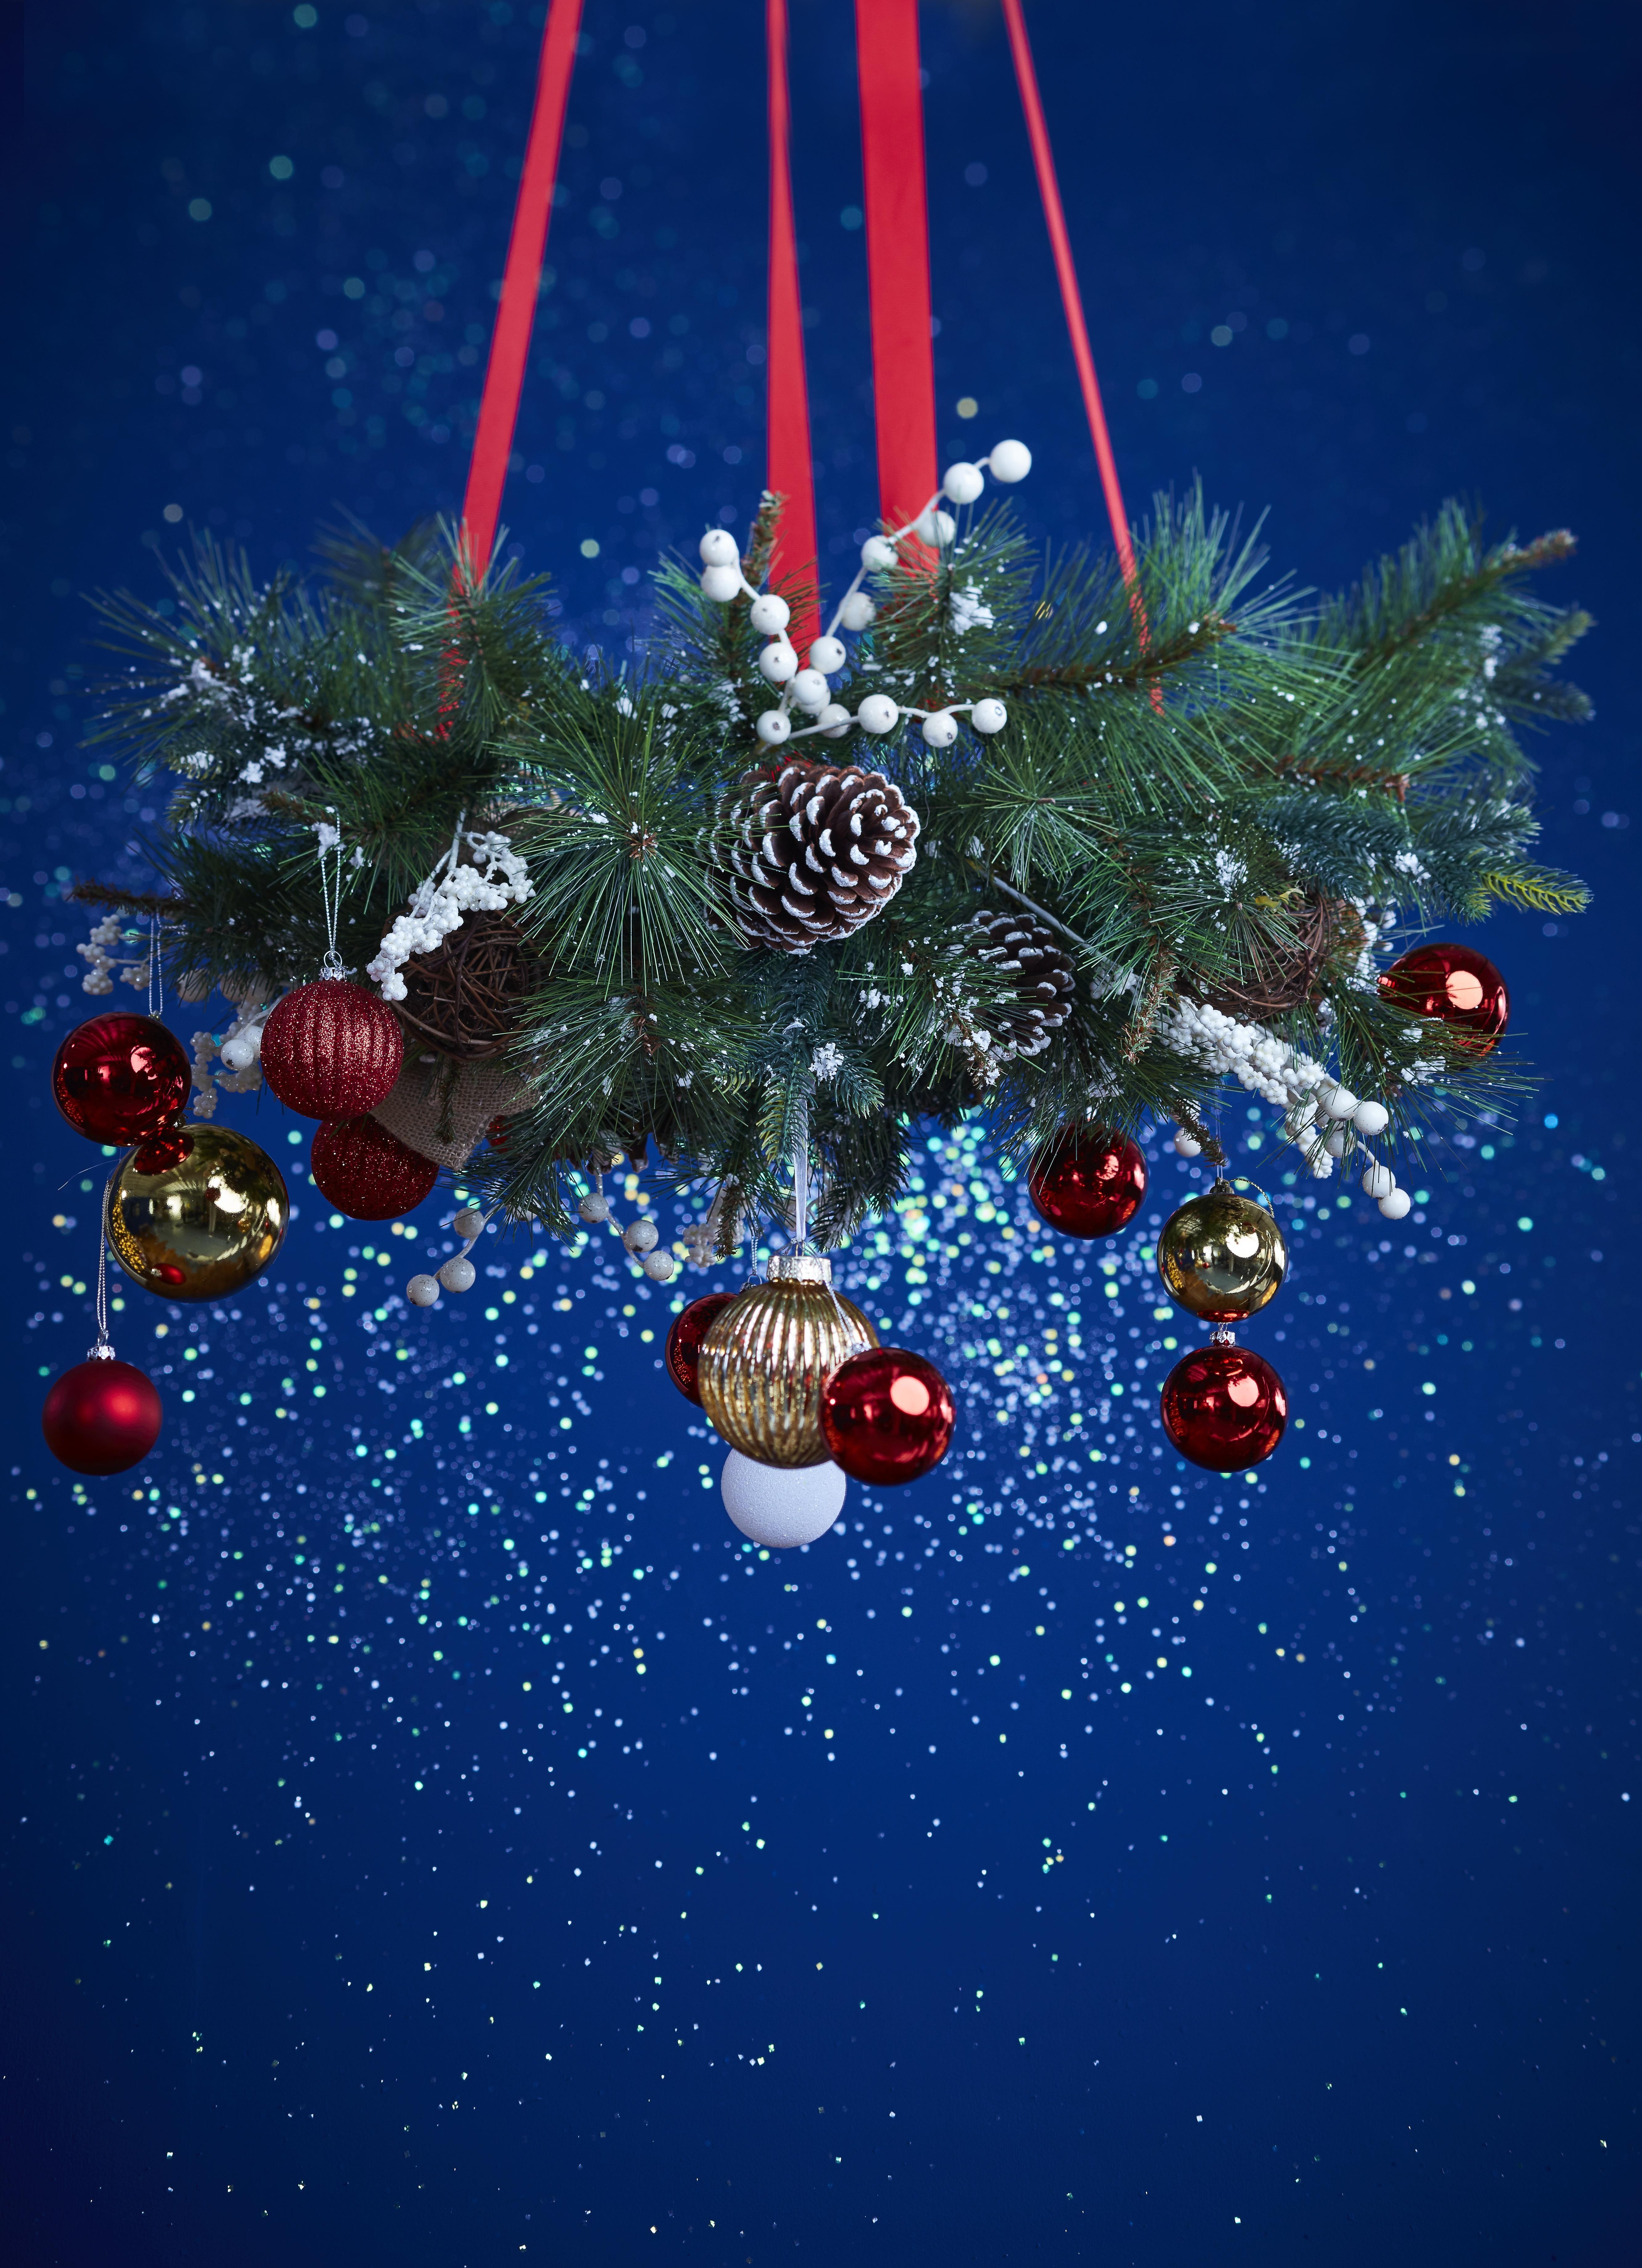 Christmas - Christmas Trees, Lights & Baubles - Diy At